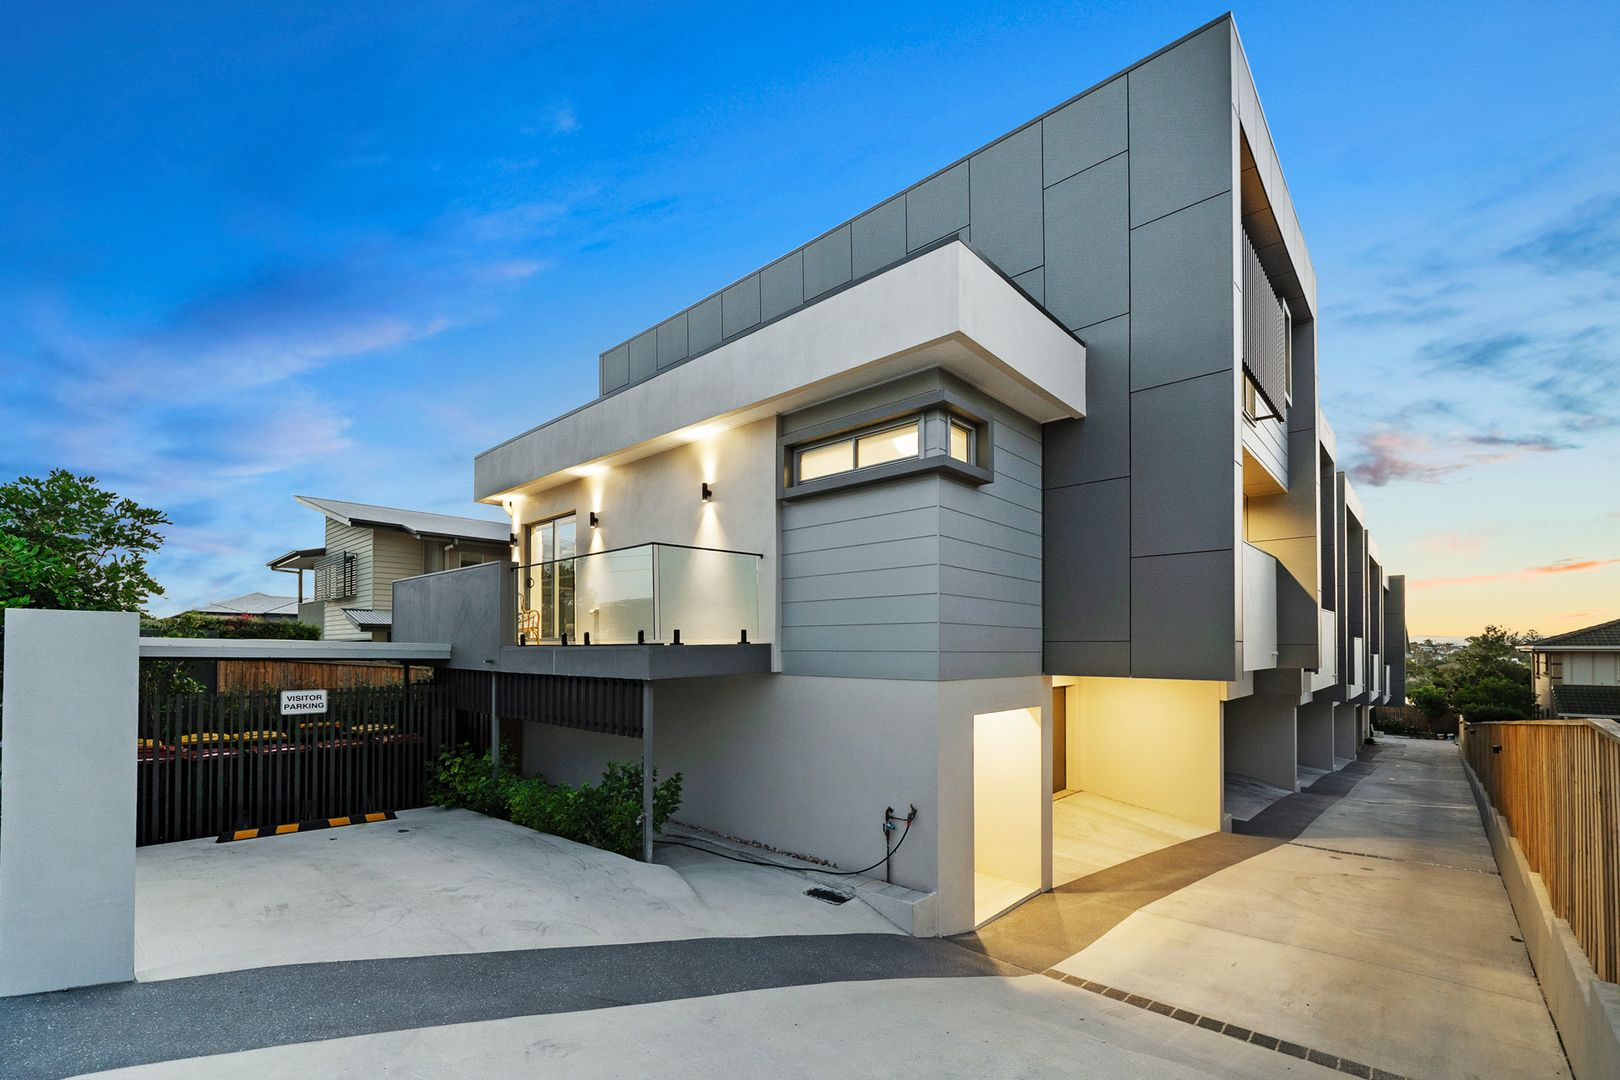 1/29 Cambridge Street, Carina Heights QLD 4152, Image 0